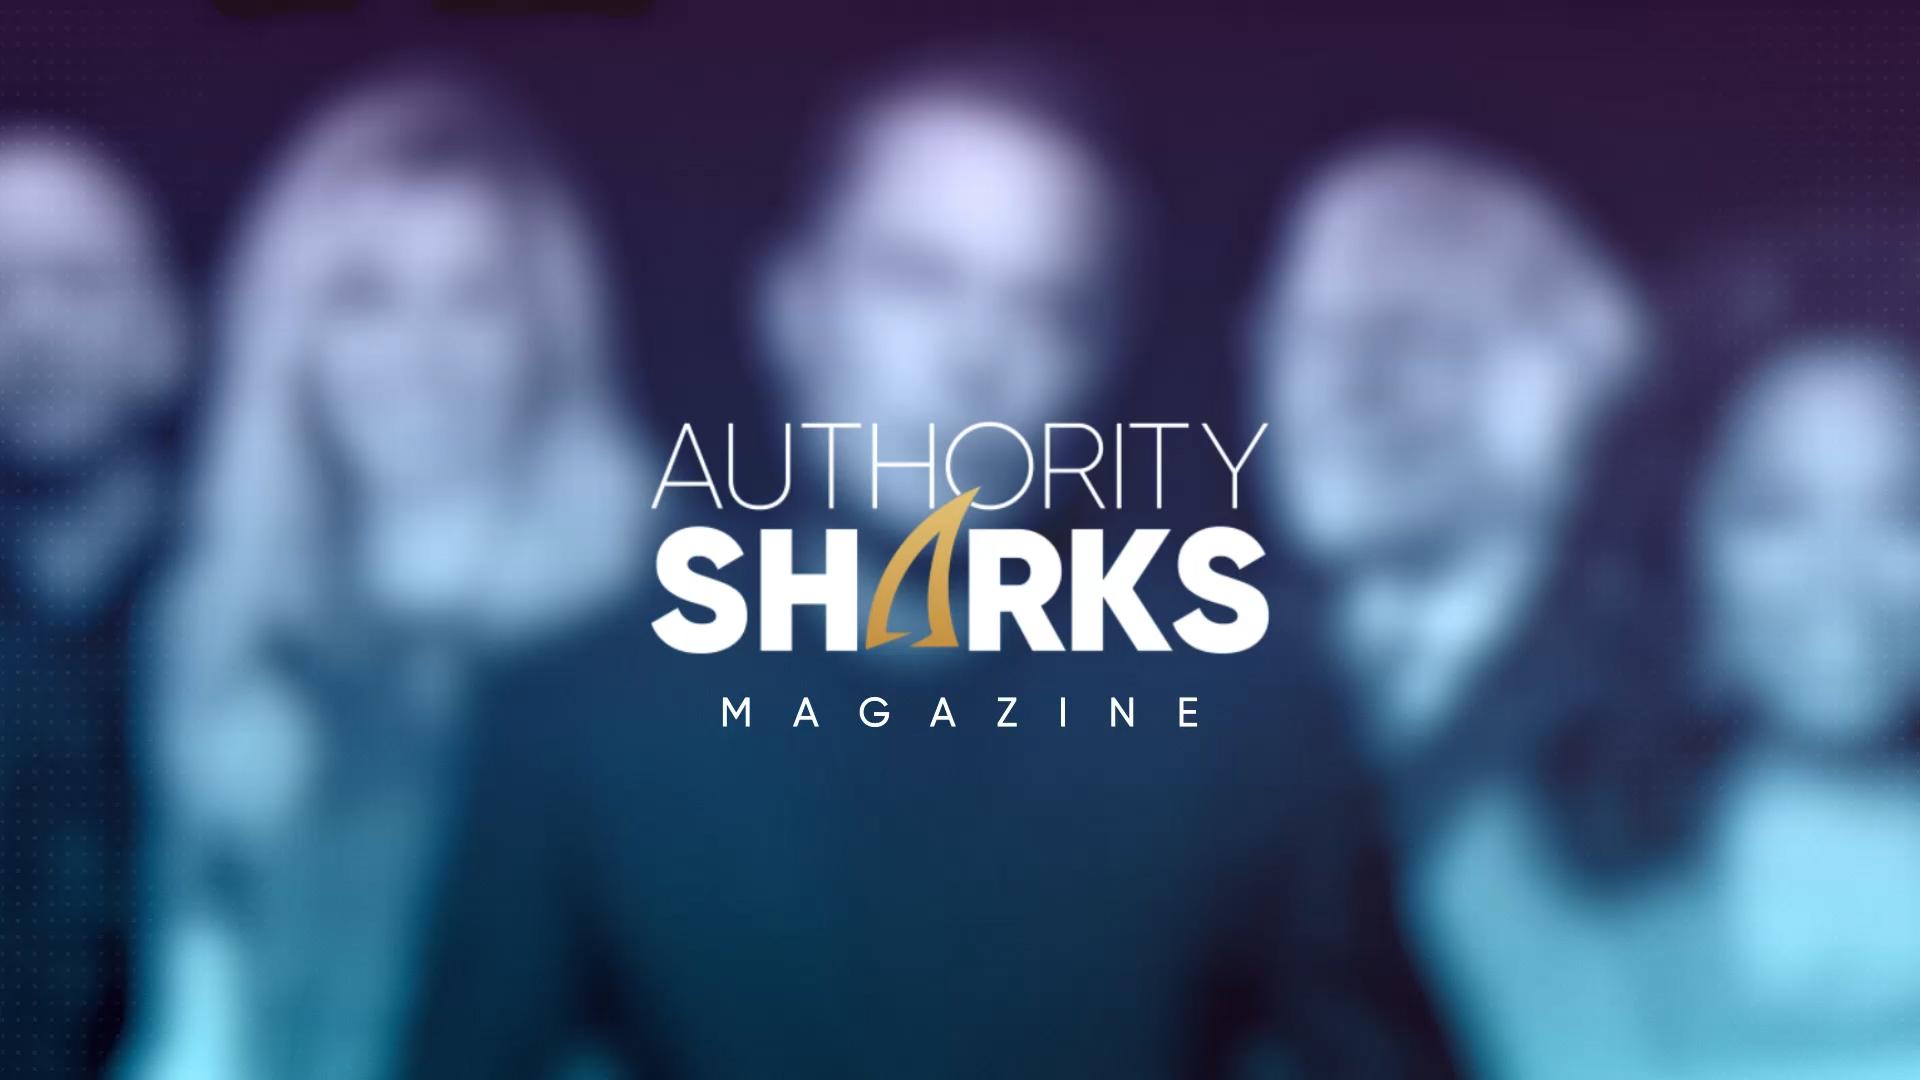 Authority Sharks